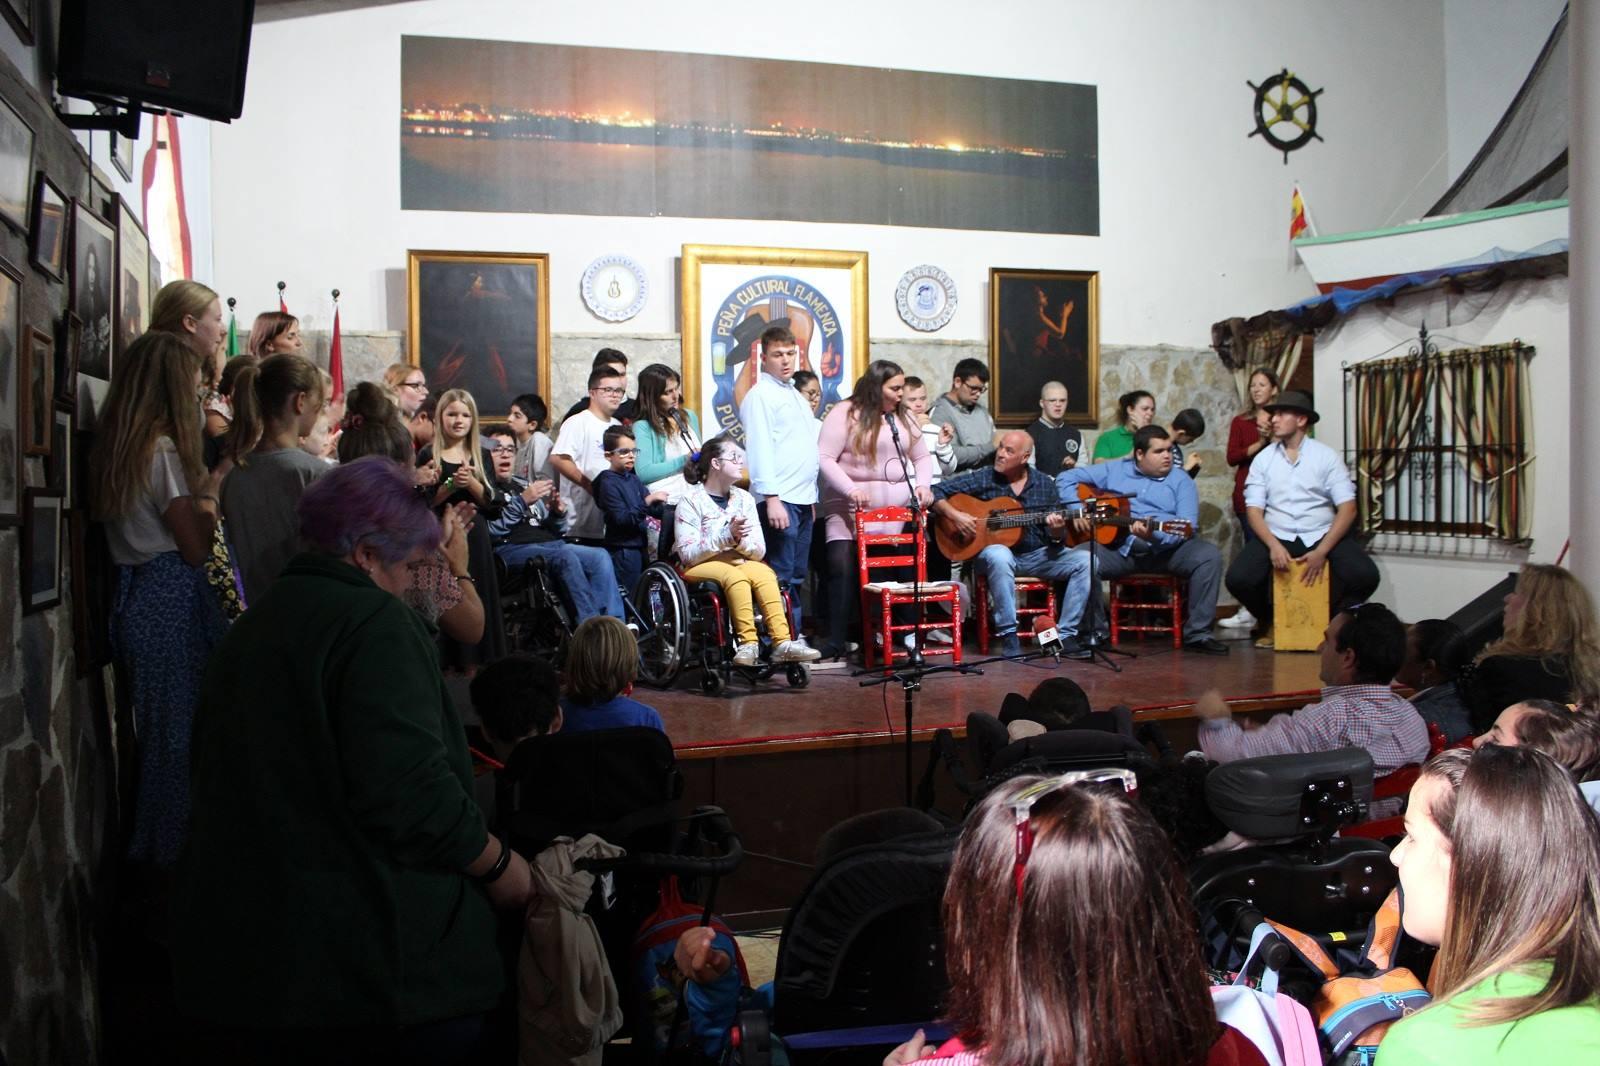 flamenco 6 (44113639_2155800928013128_6695454878858215424_o.jpg)